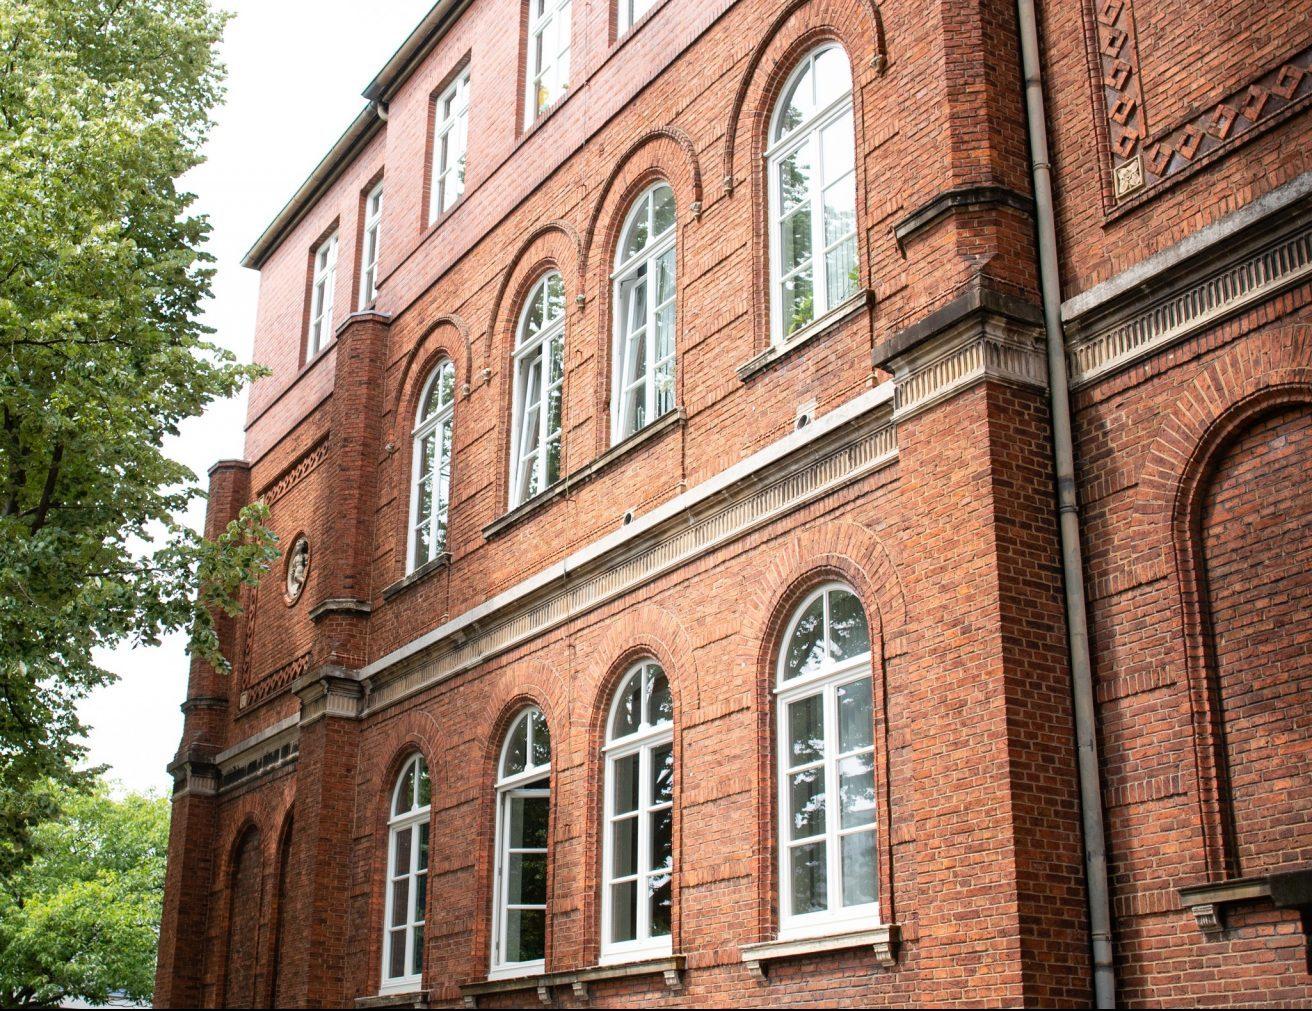 Herbartgymnasium Oldenburg